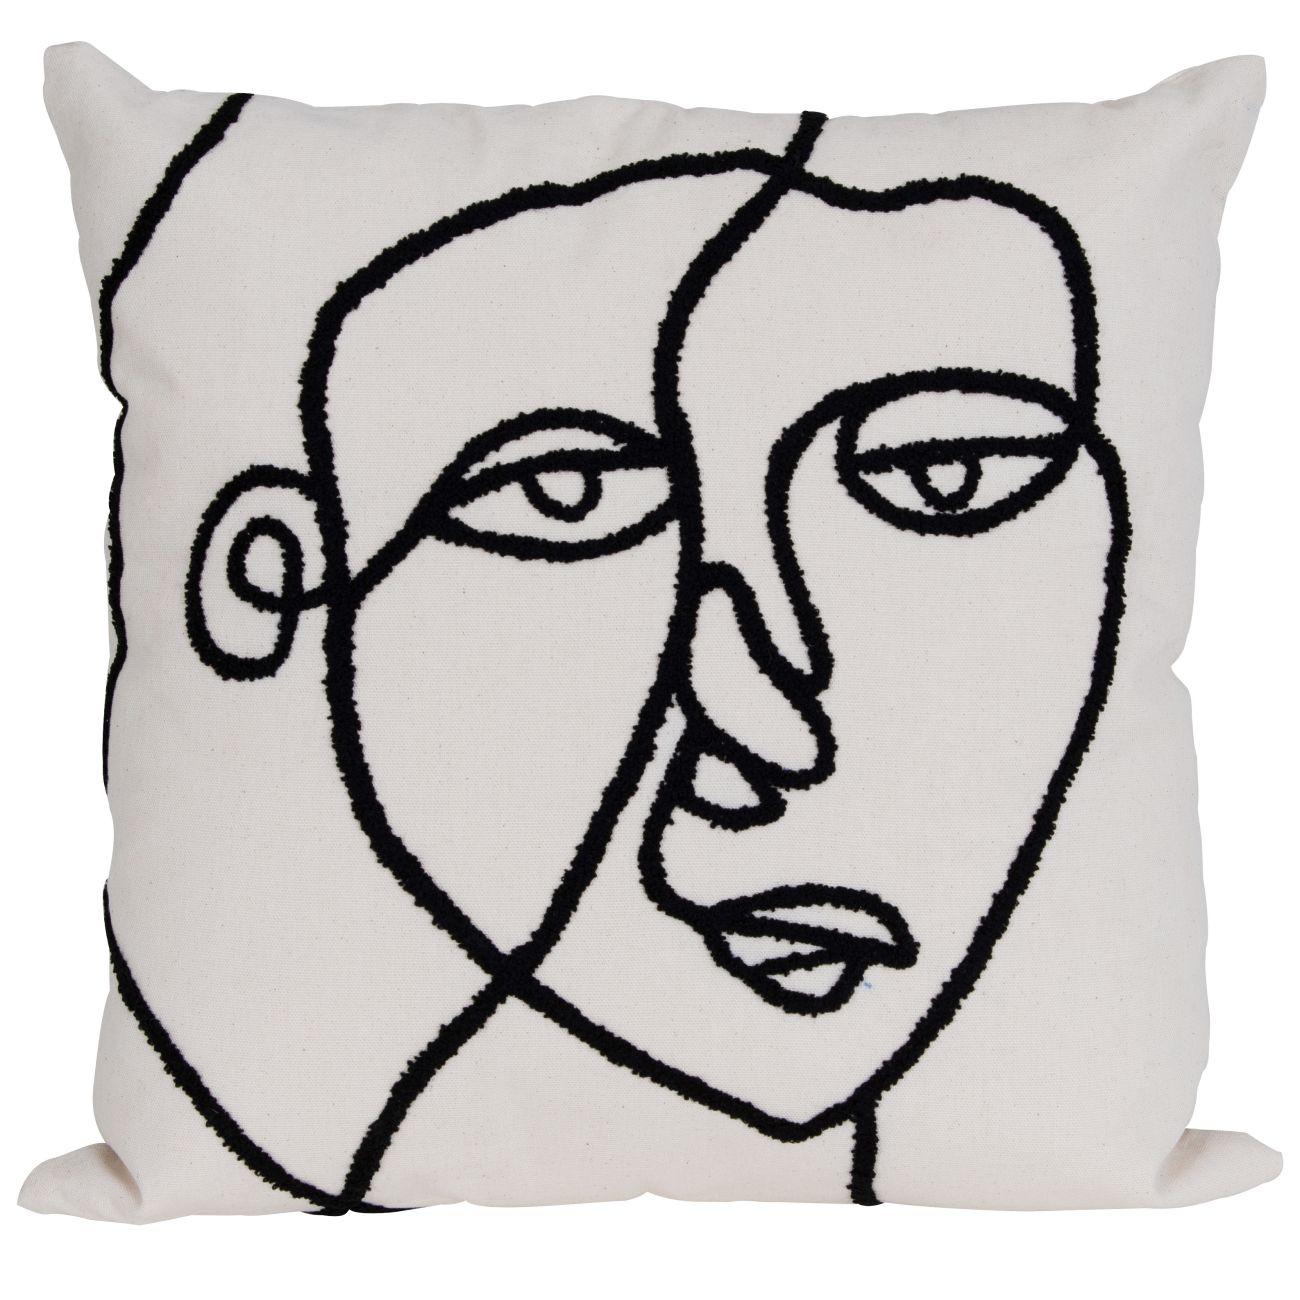 abstract face cushion